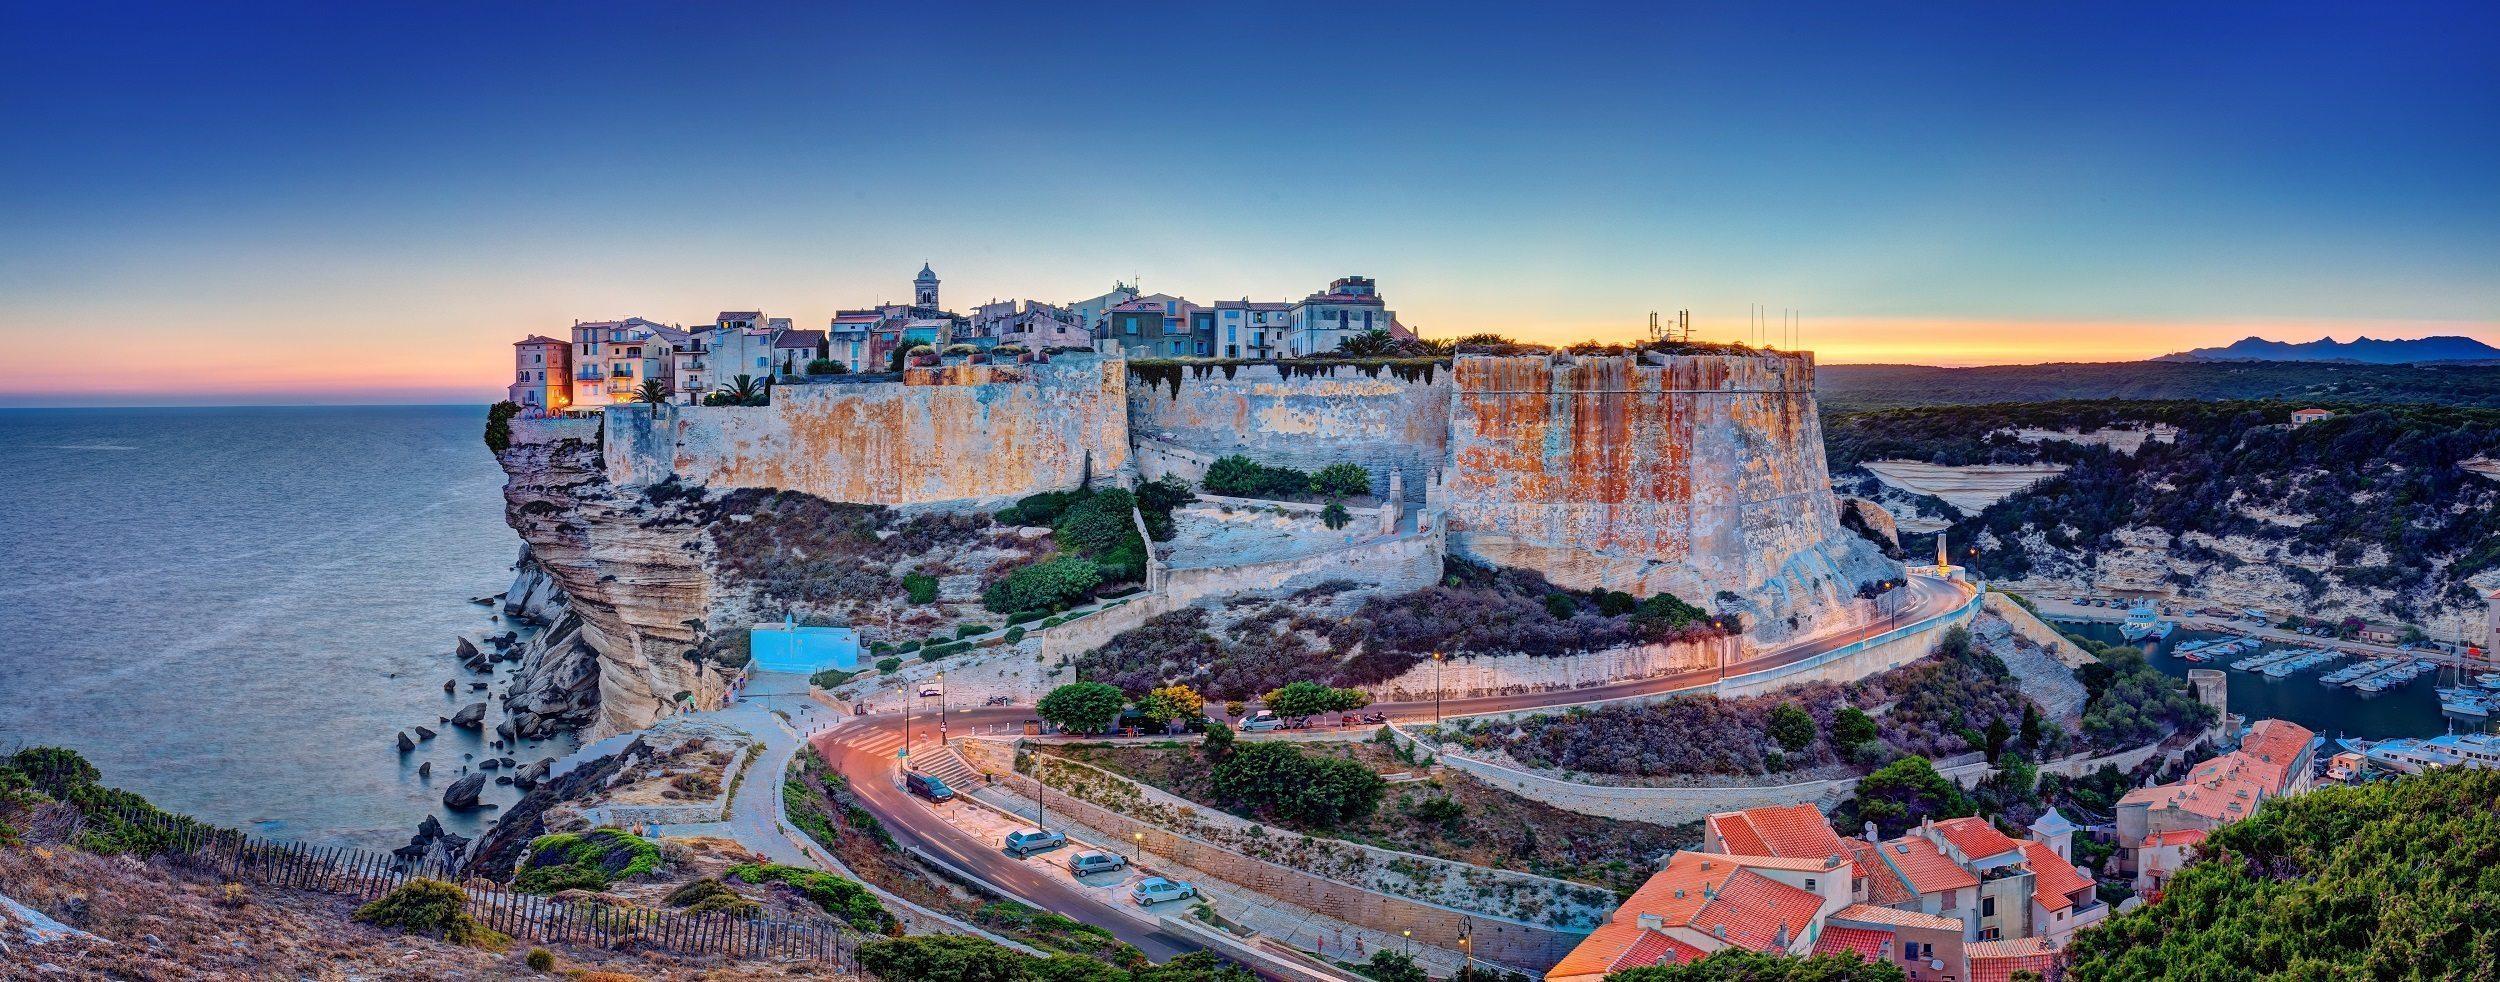 Bonifacio Citadel Corsica - All Luxury Apartments